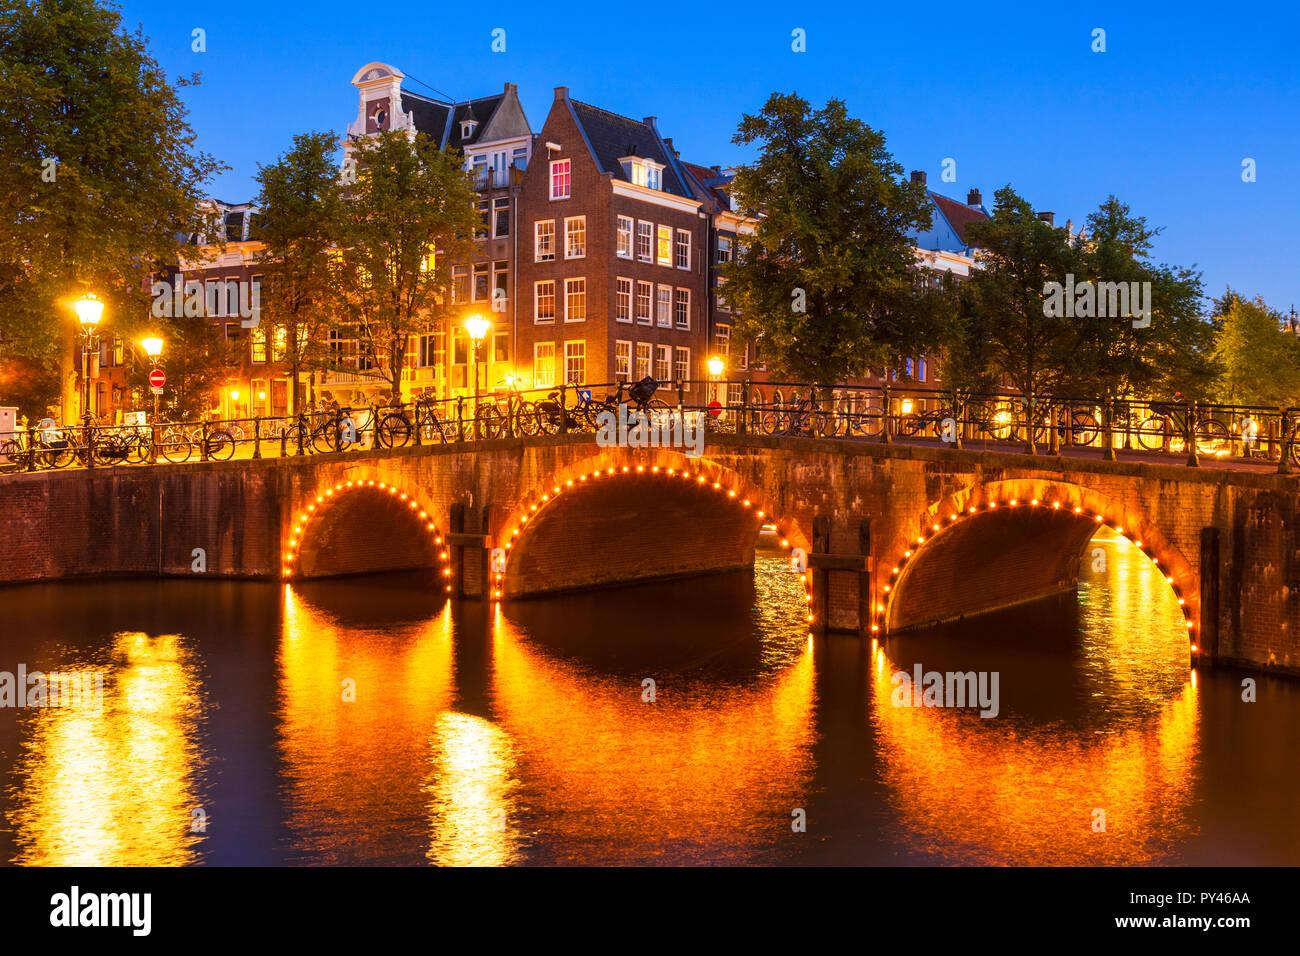 Illuminata di Amsterdam canal ponte sul canale Keizergracht e ponte Leliegracht Amsterdam Olanda Paesi Bassi EU Europe Immagini Stock